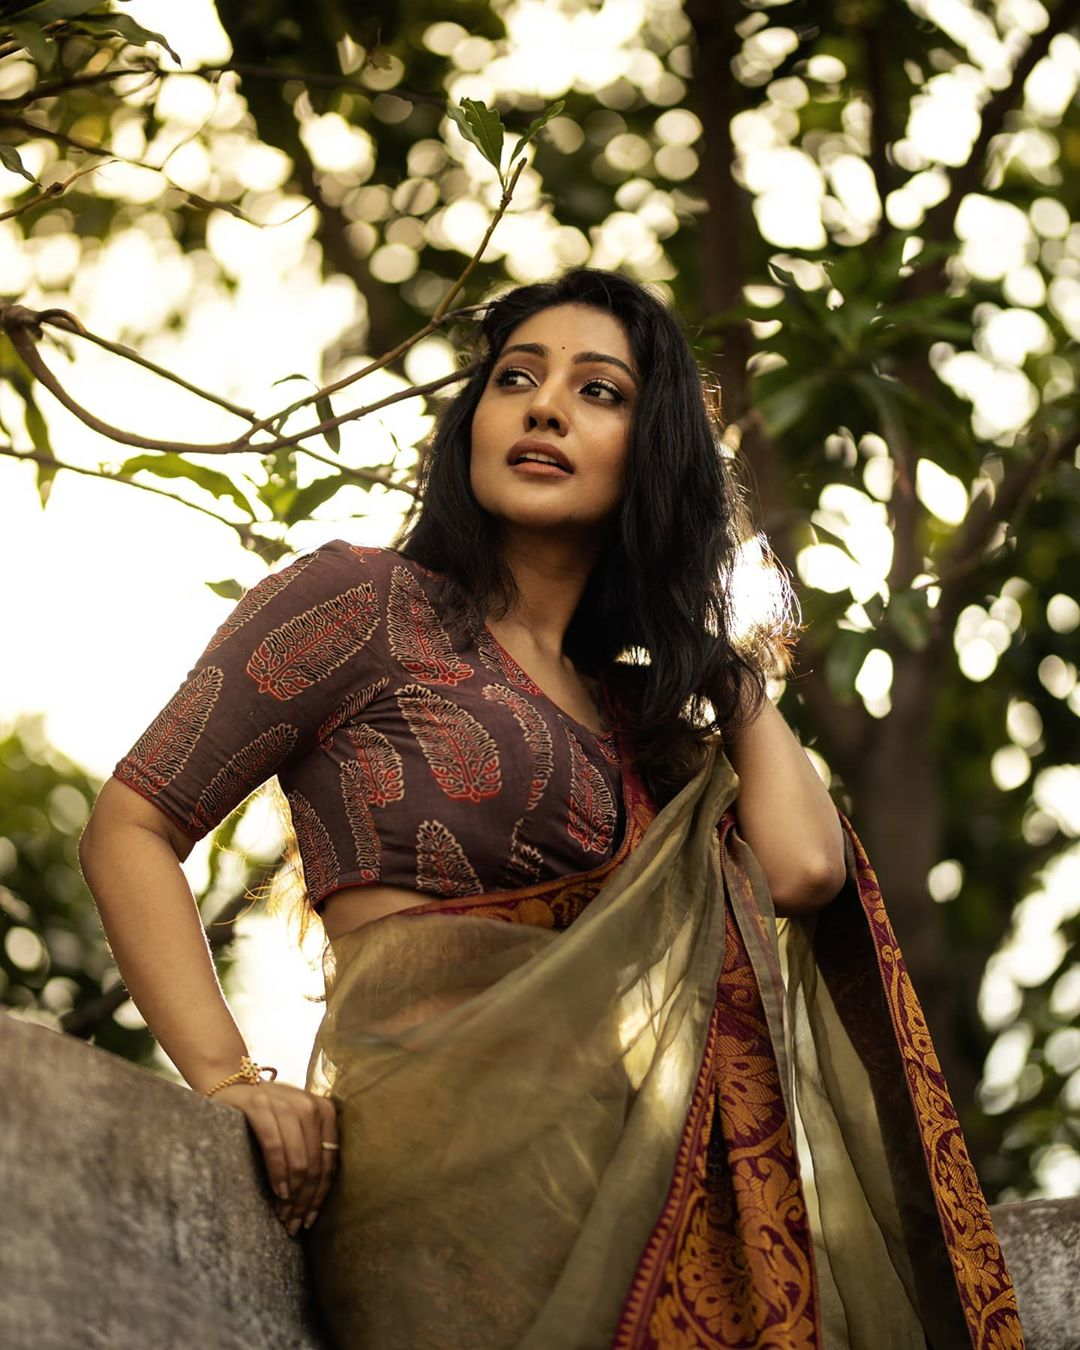 Bommu Lakshmi photos (53)